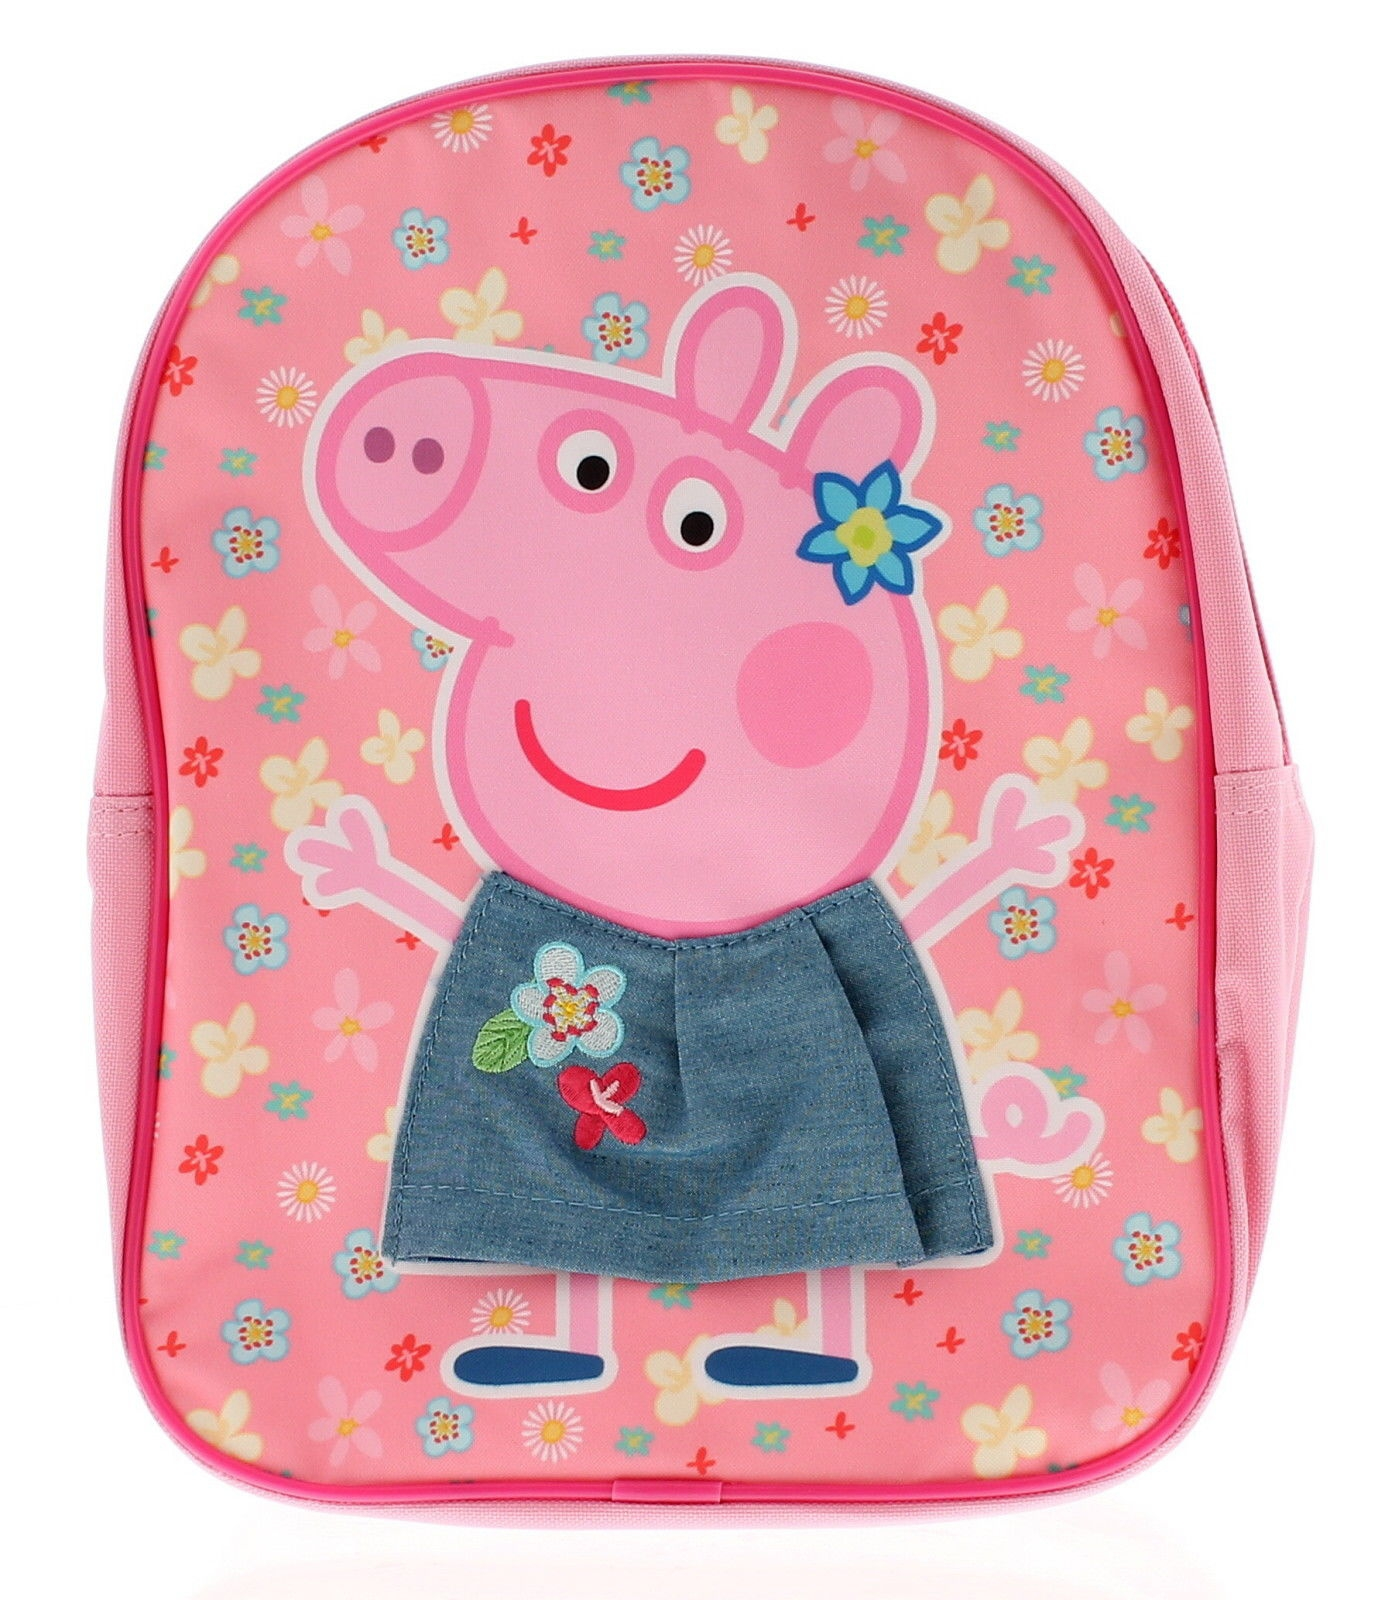 Peppa Pig 3d Skirt School Bag Rucksack Backpack